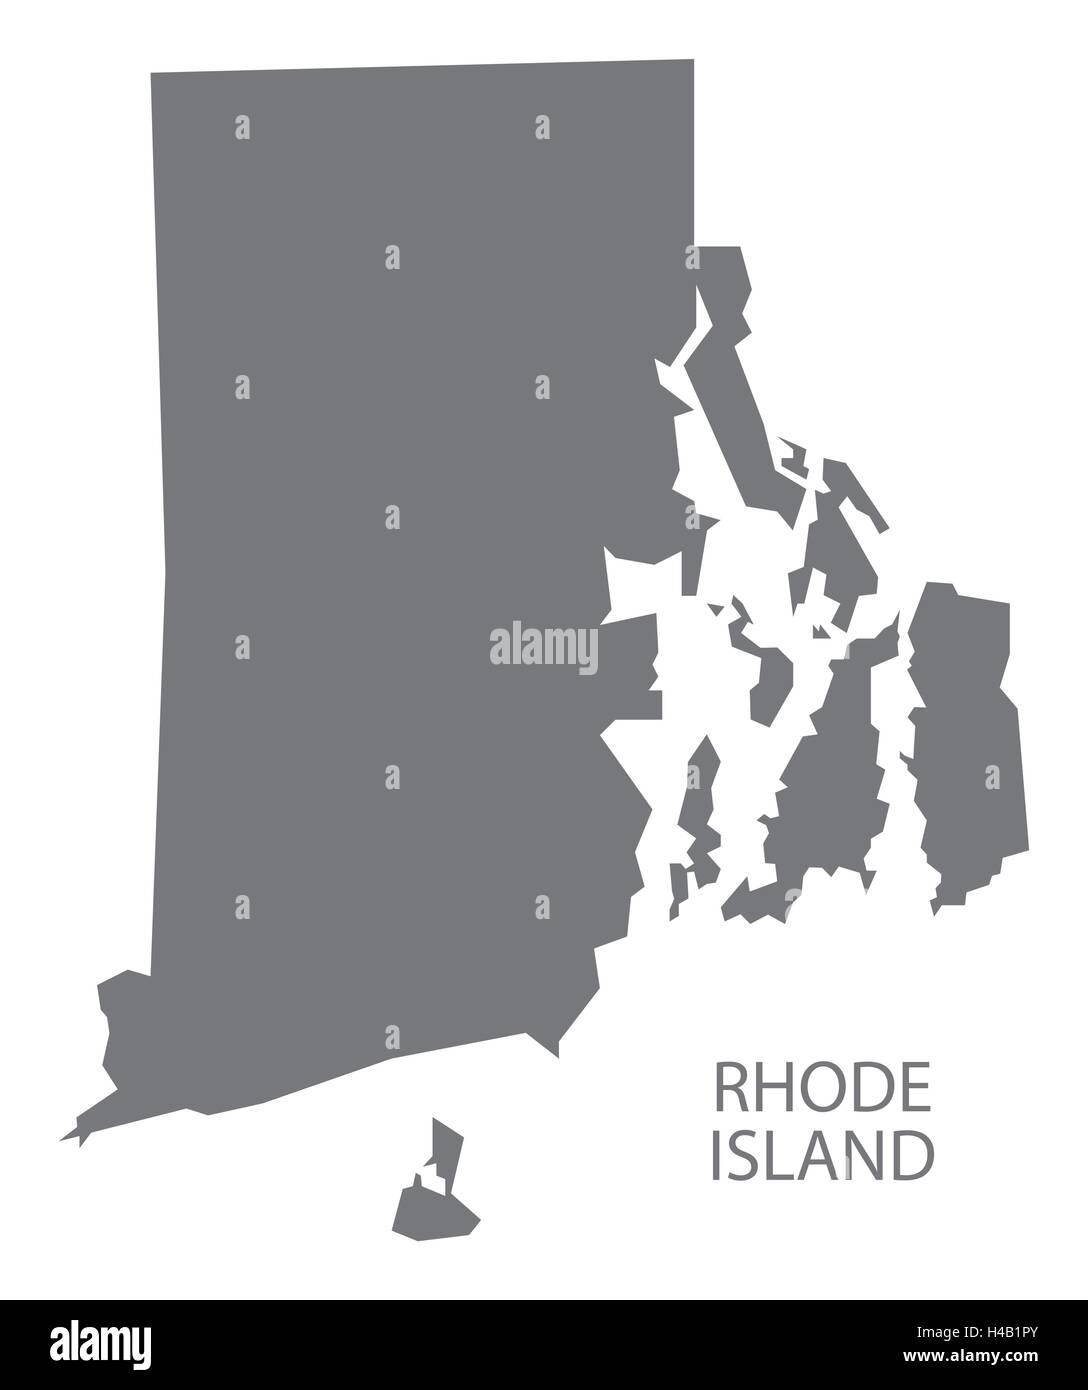 Rhode Island USA Map In Grey Stock Vector Art  Illustration - Rhode island in usa map